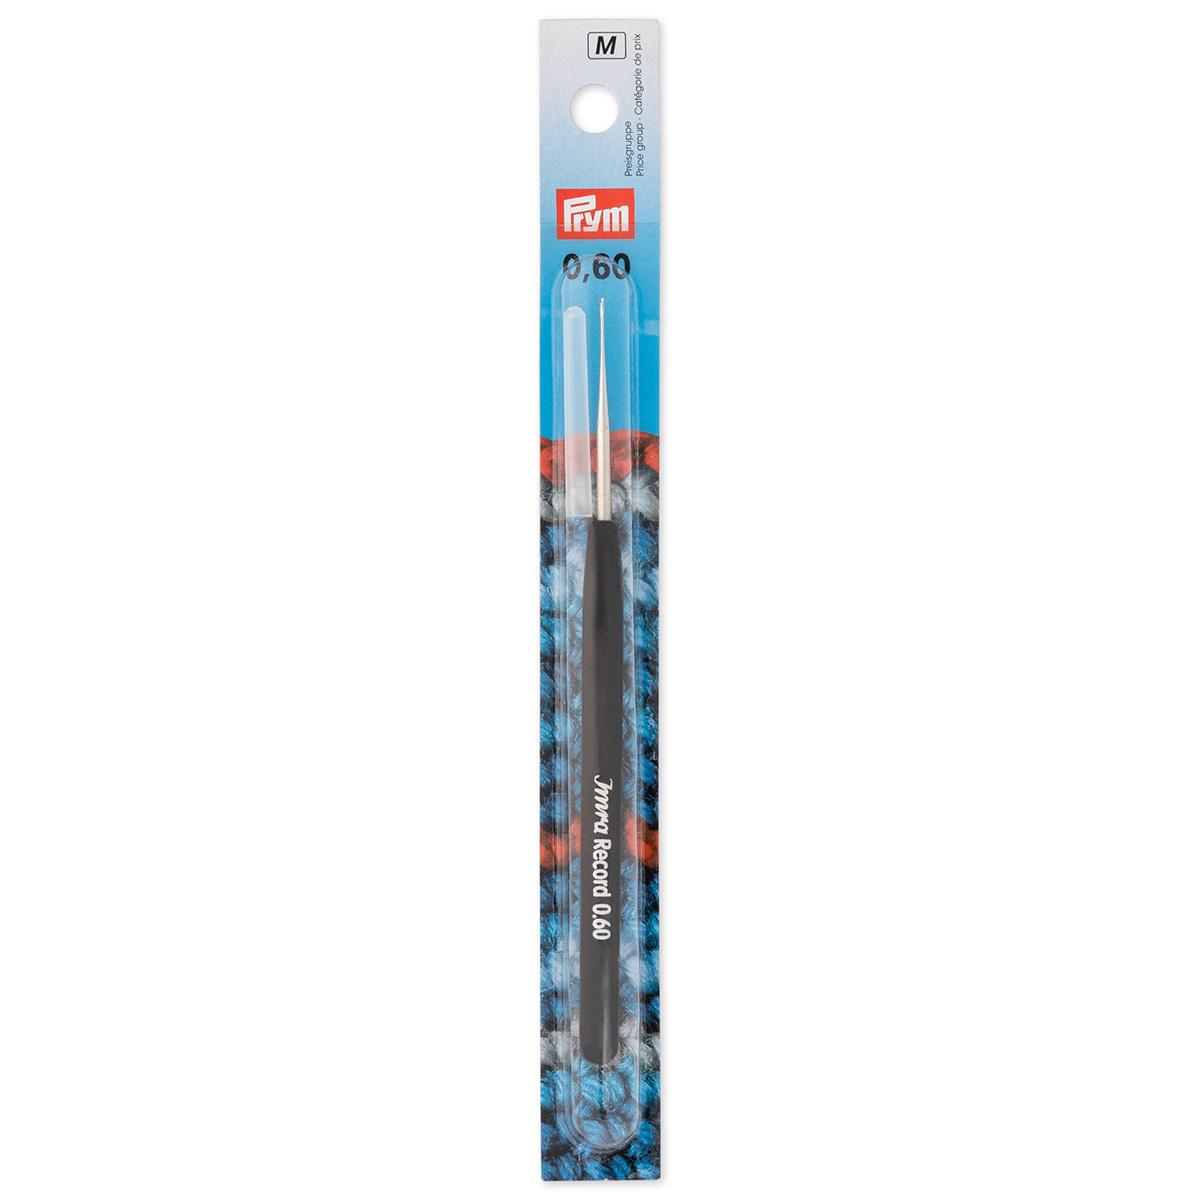 175625 Крючок IMRA Record для тонкой пряжи, мягкая ручка, сталь, 0,6 мм, Prym